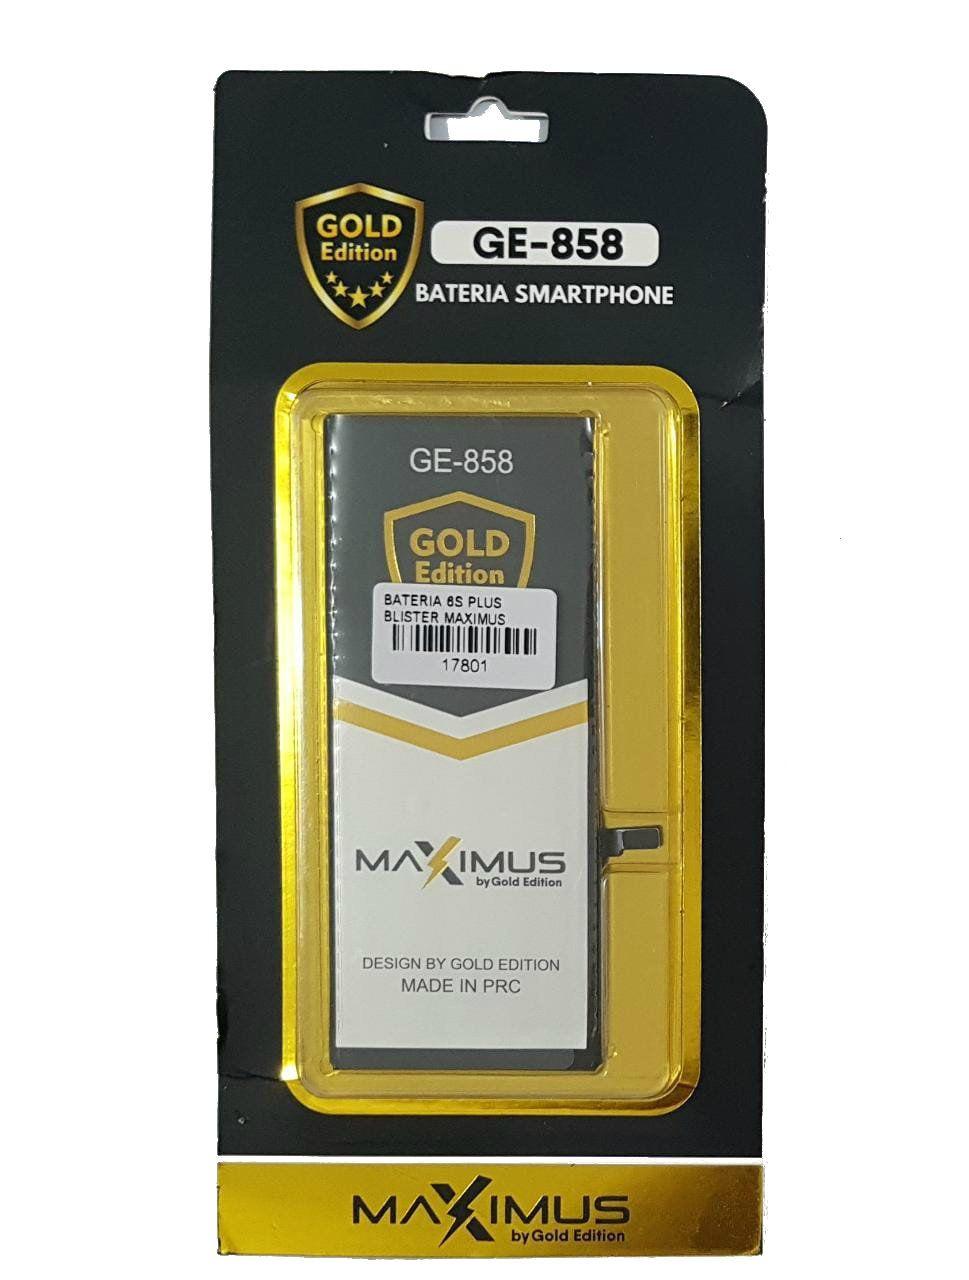 Bateria iPhone 6S Plus Blister Maximus GE-858 2750mAh